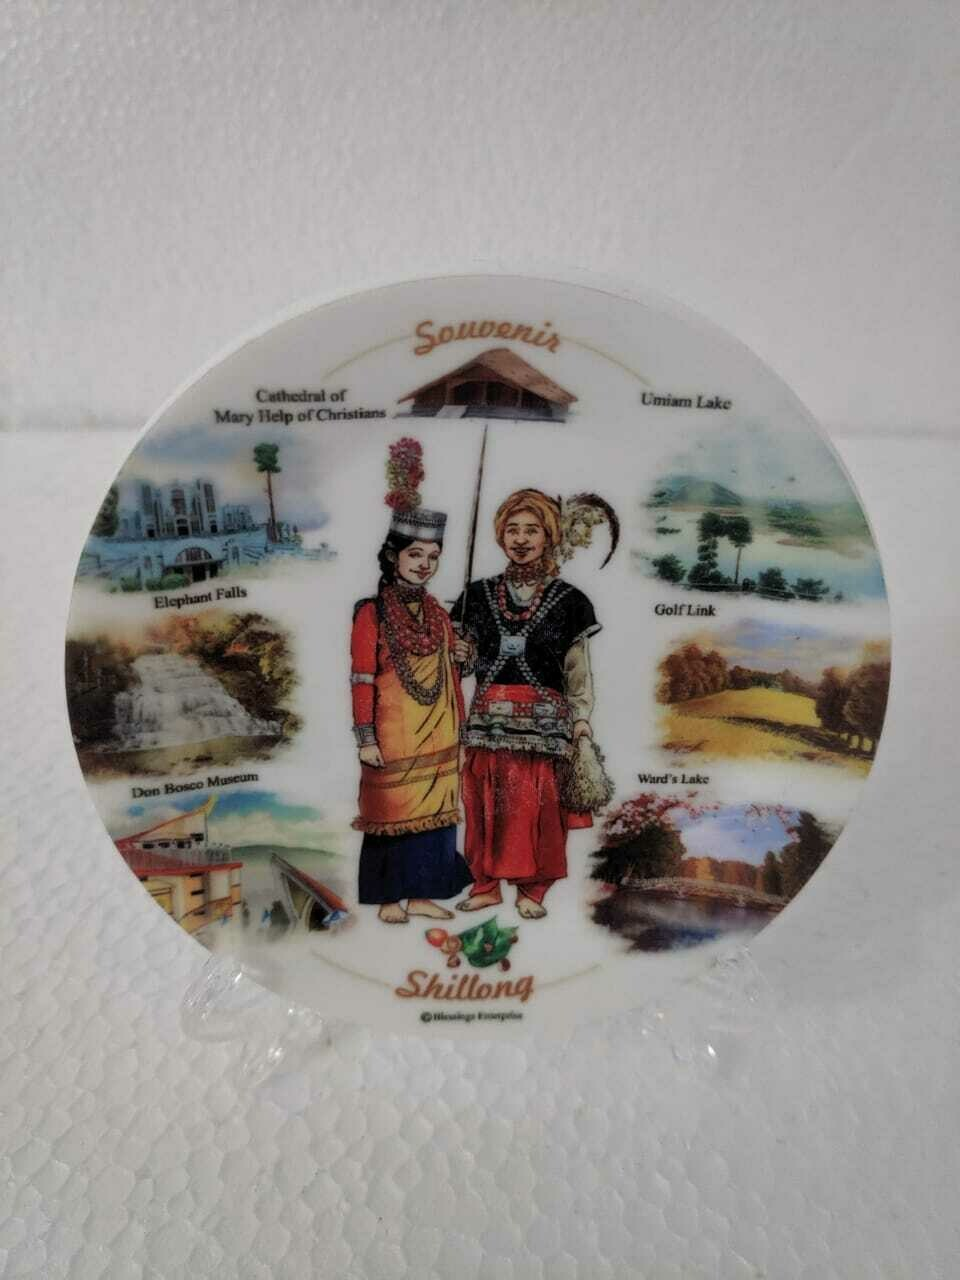 CountrySpices Meghalaya Souvenir